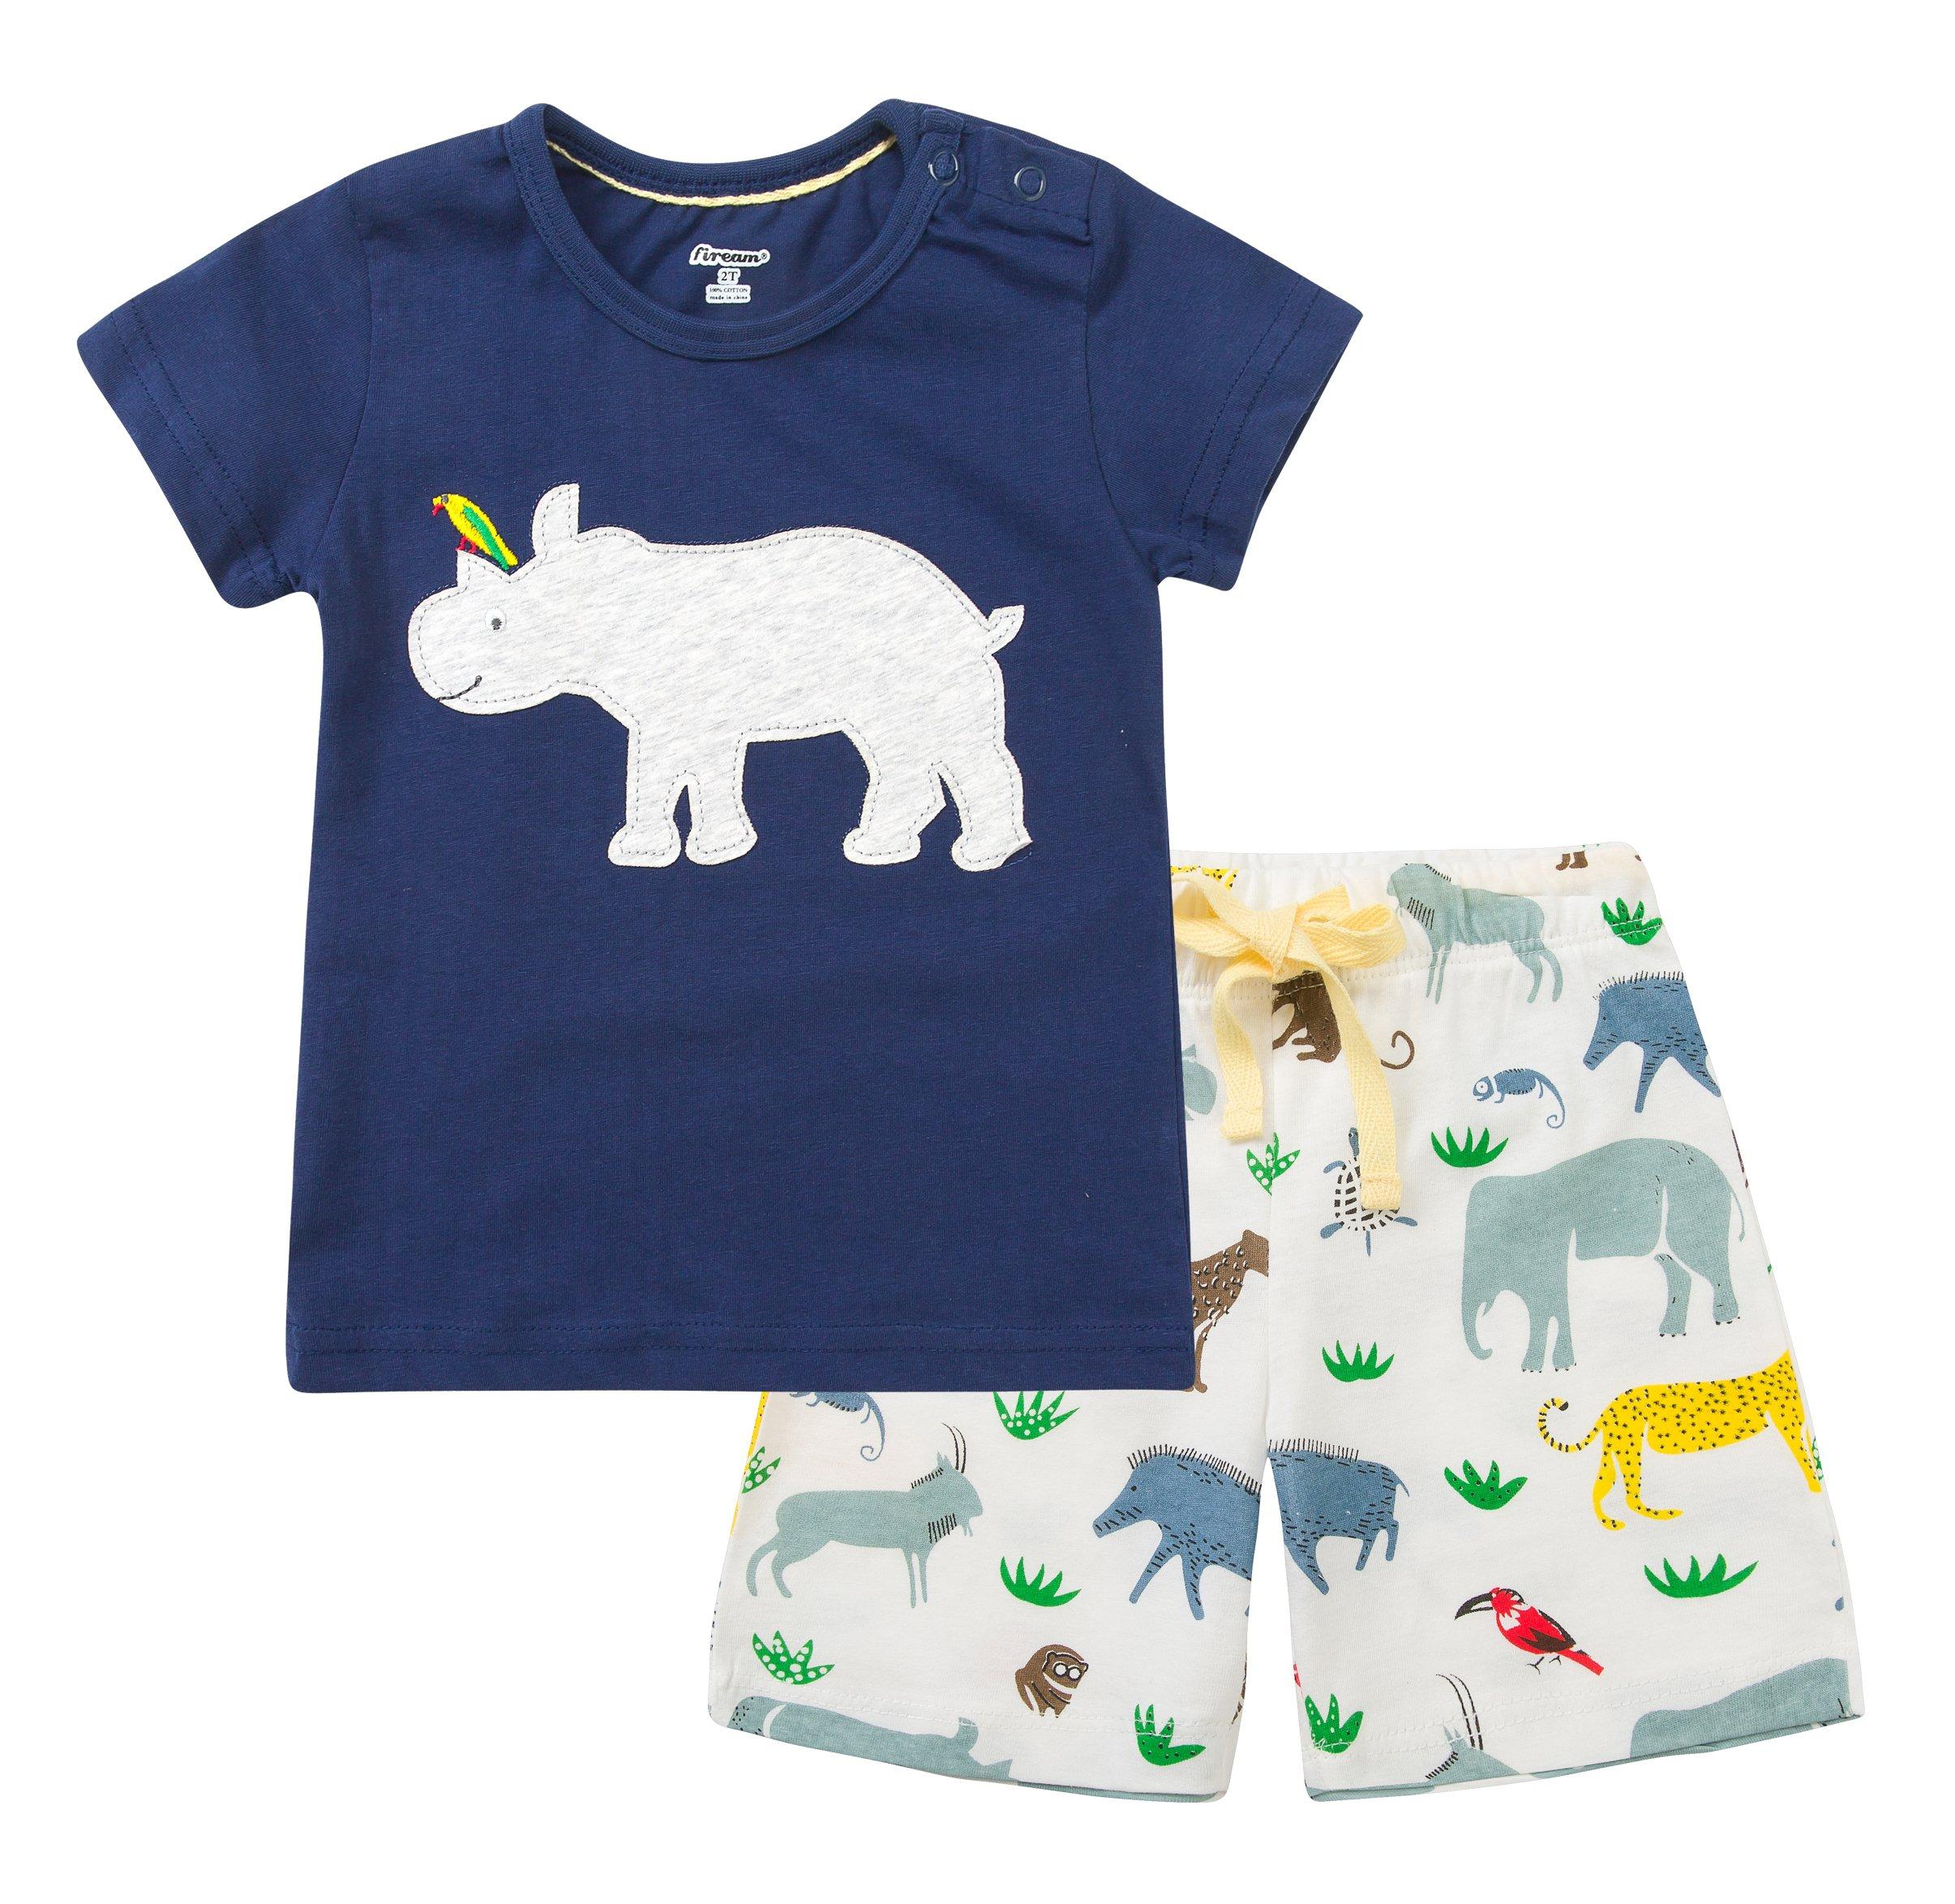 Fiream Baby Boy's Cotton Cute Short Sleeve Clothing Set(105Navy,3T)